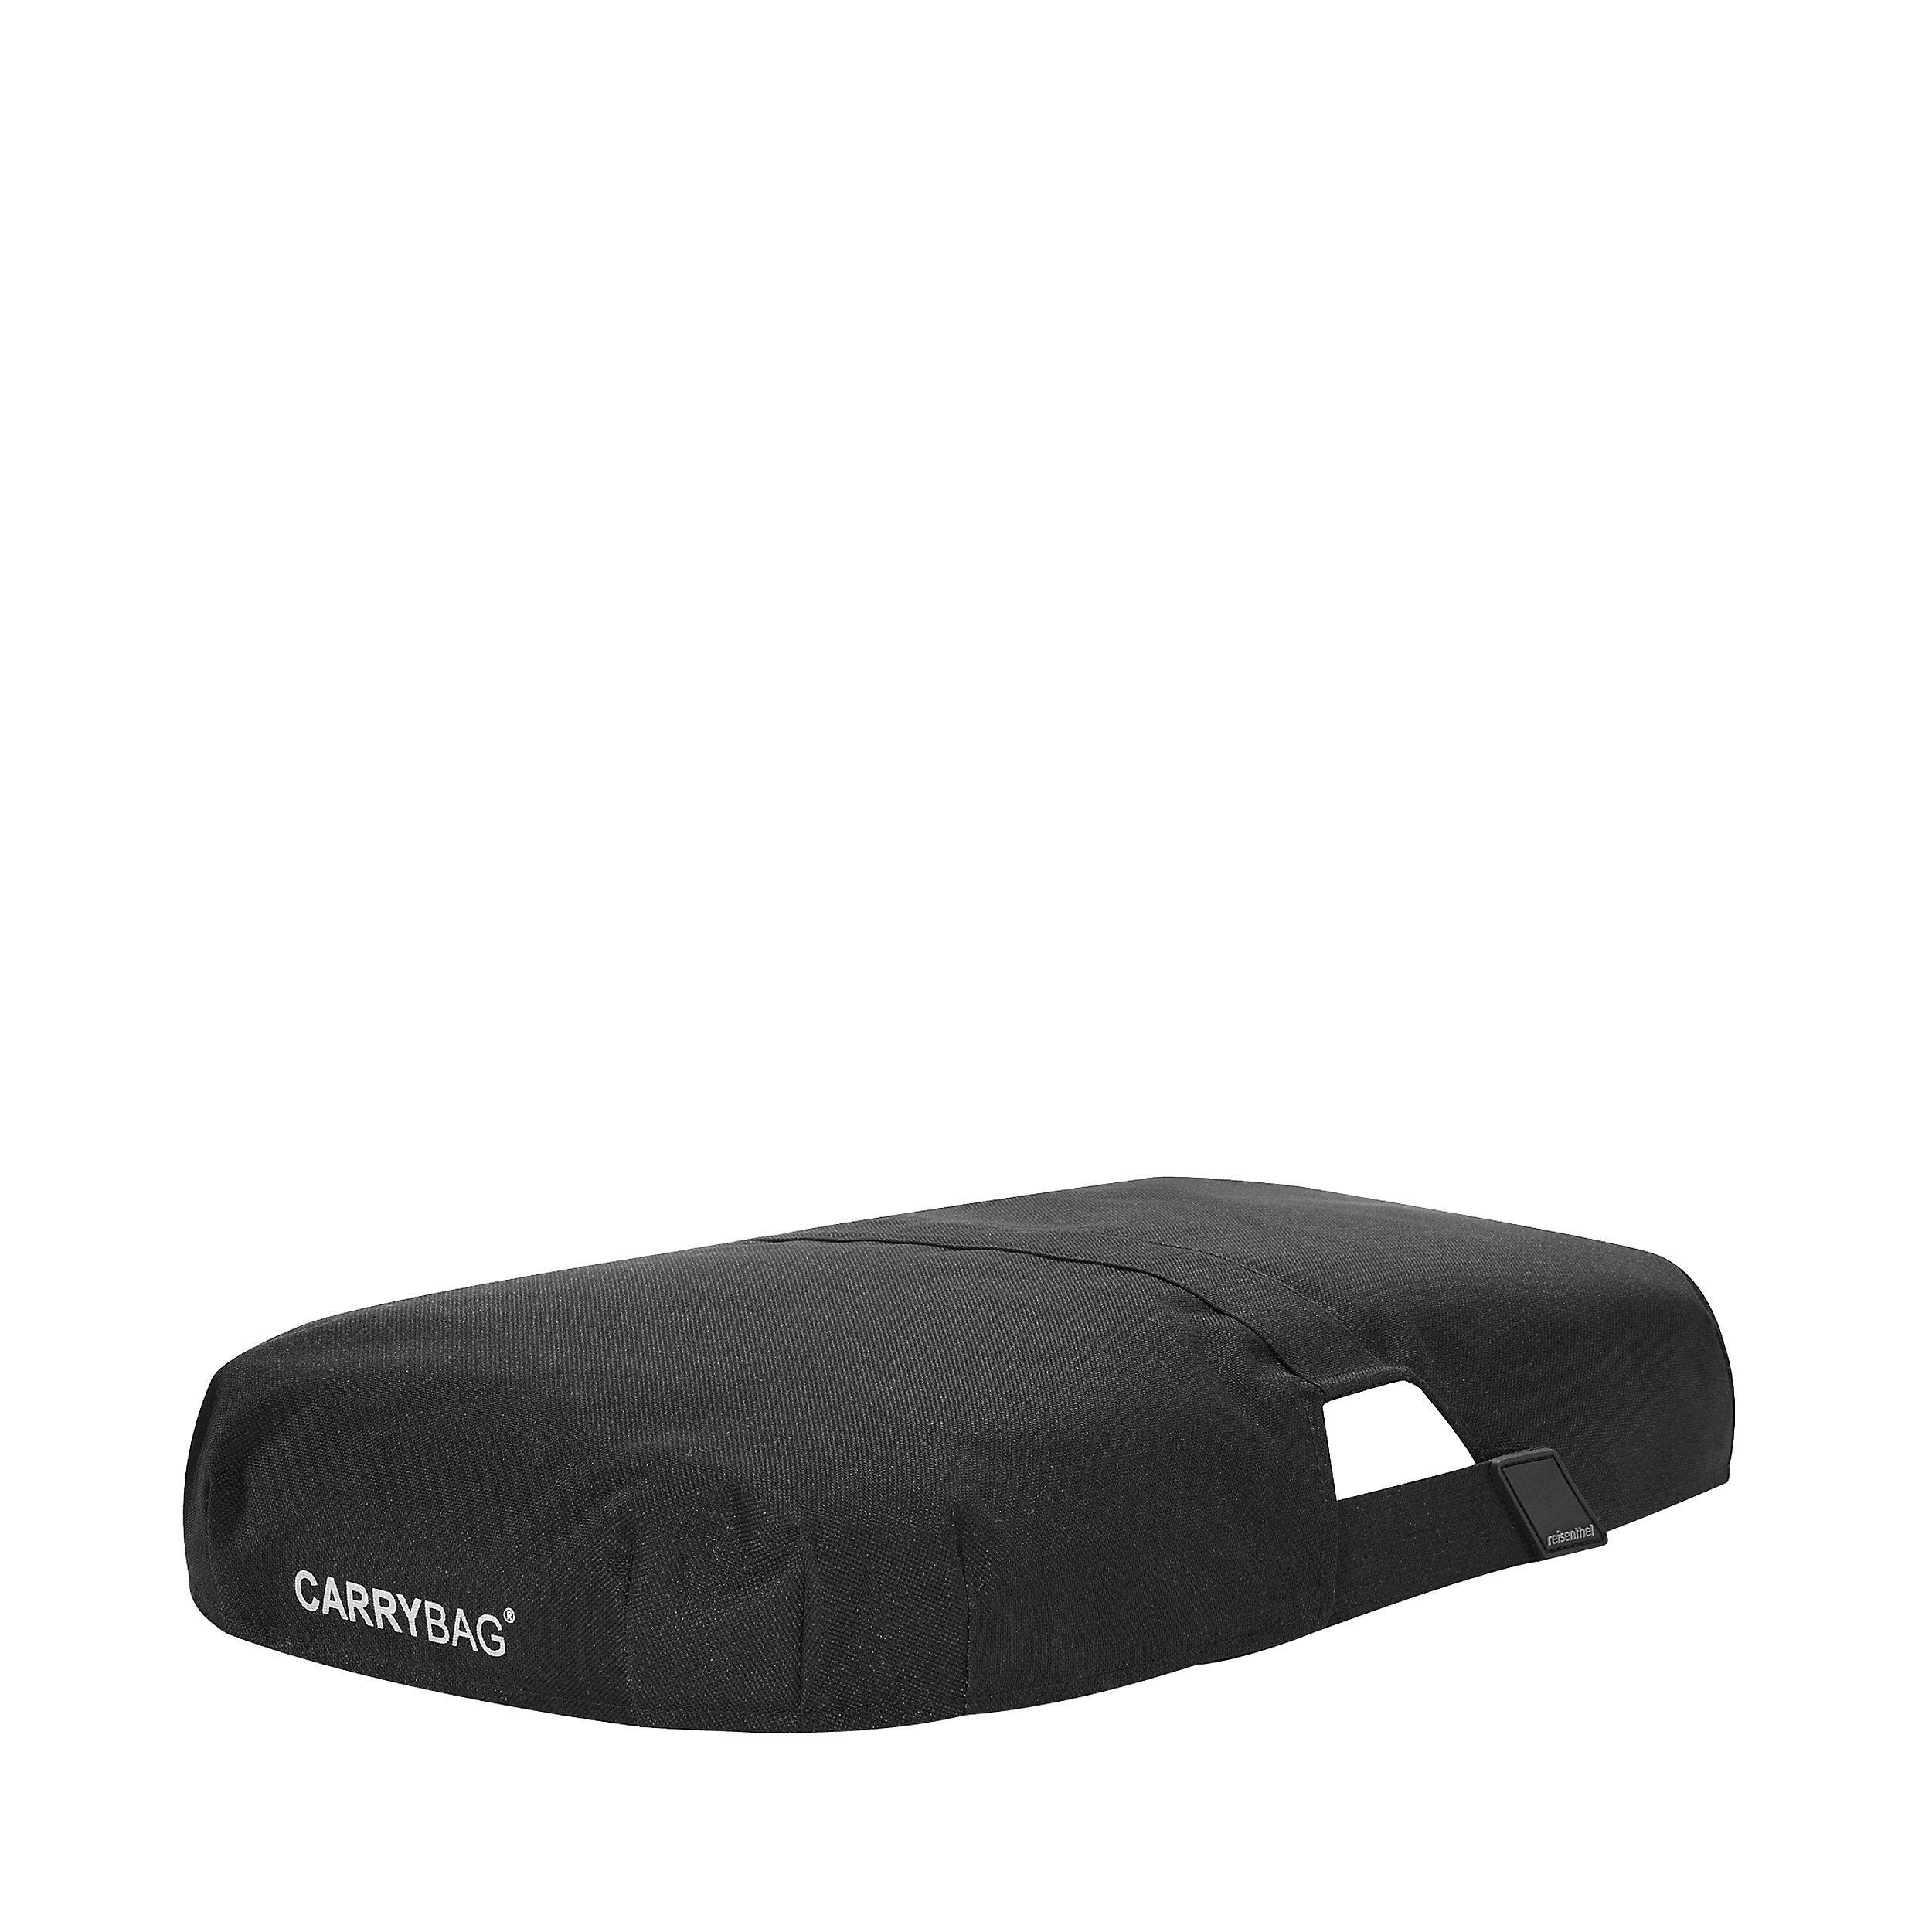 Carrybag Cover Shopping